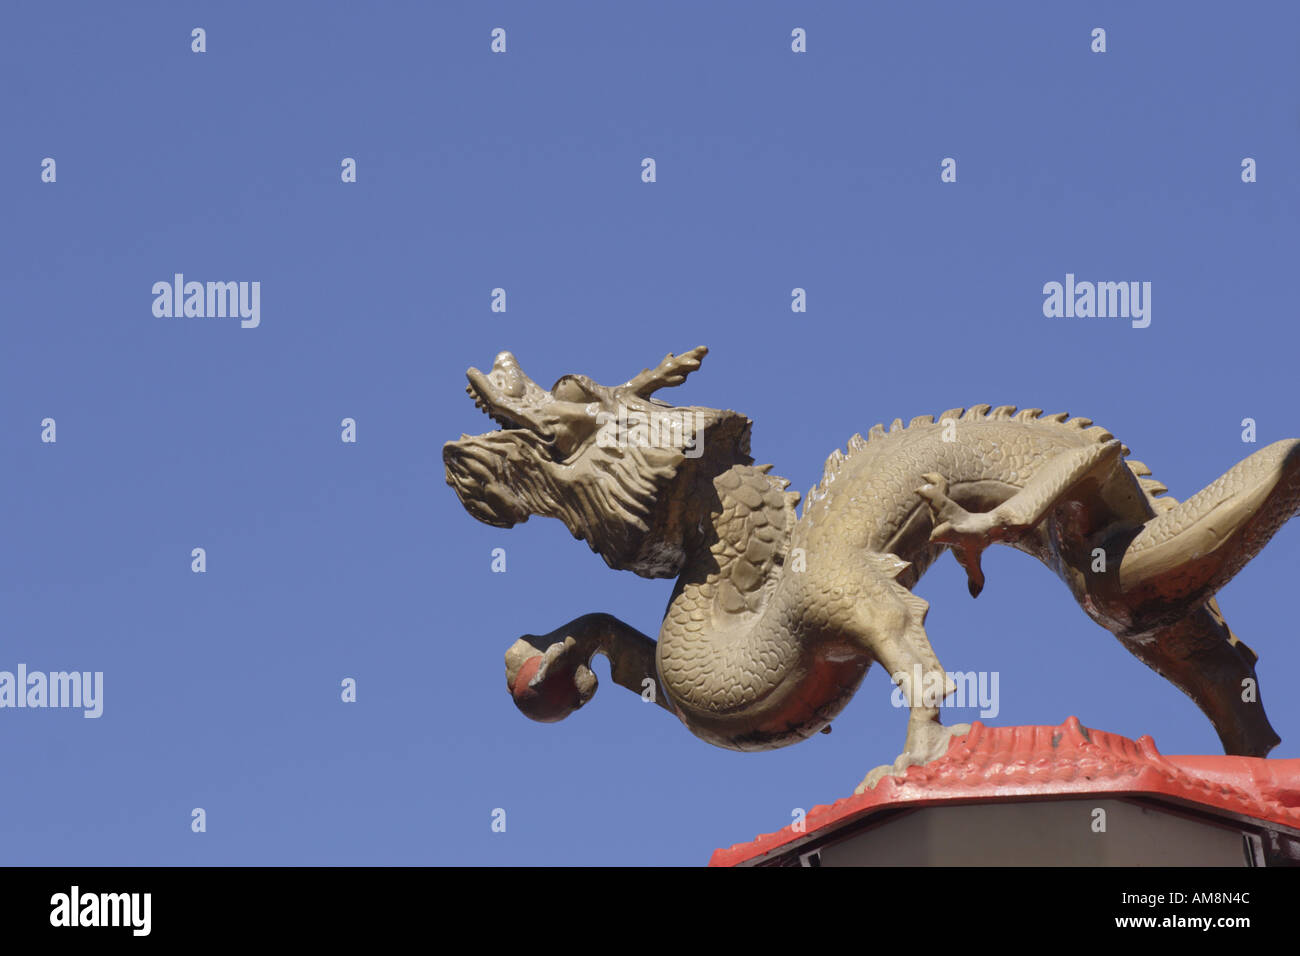 Dragon Chinatown Vancouver Canada - Stock Image